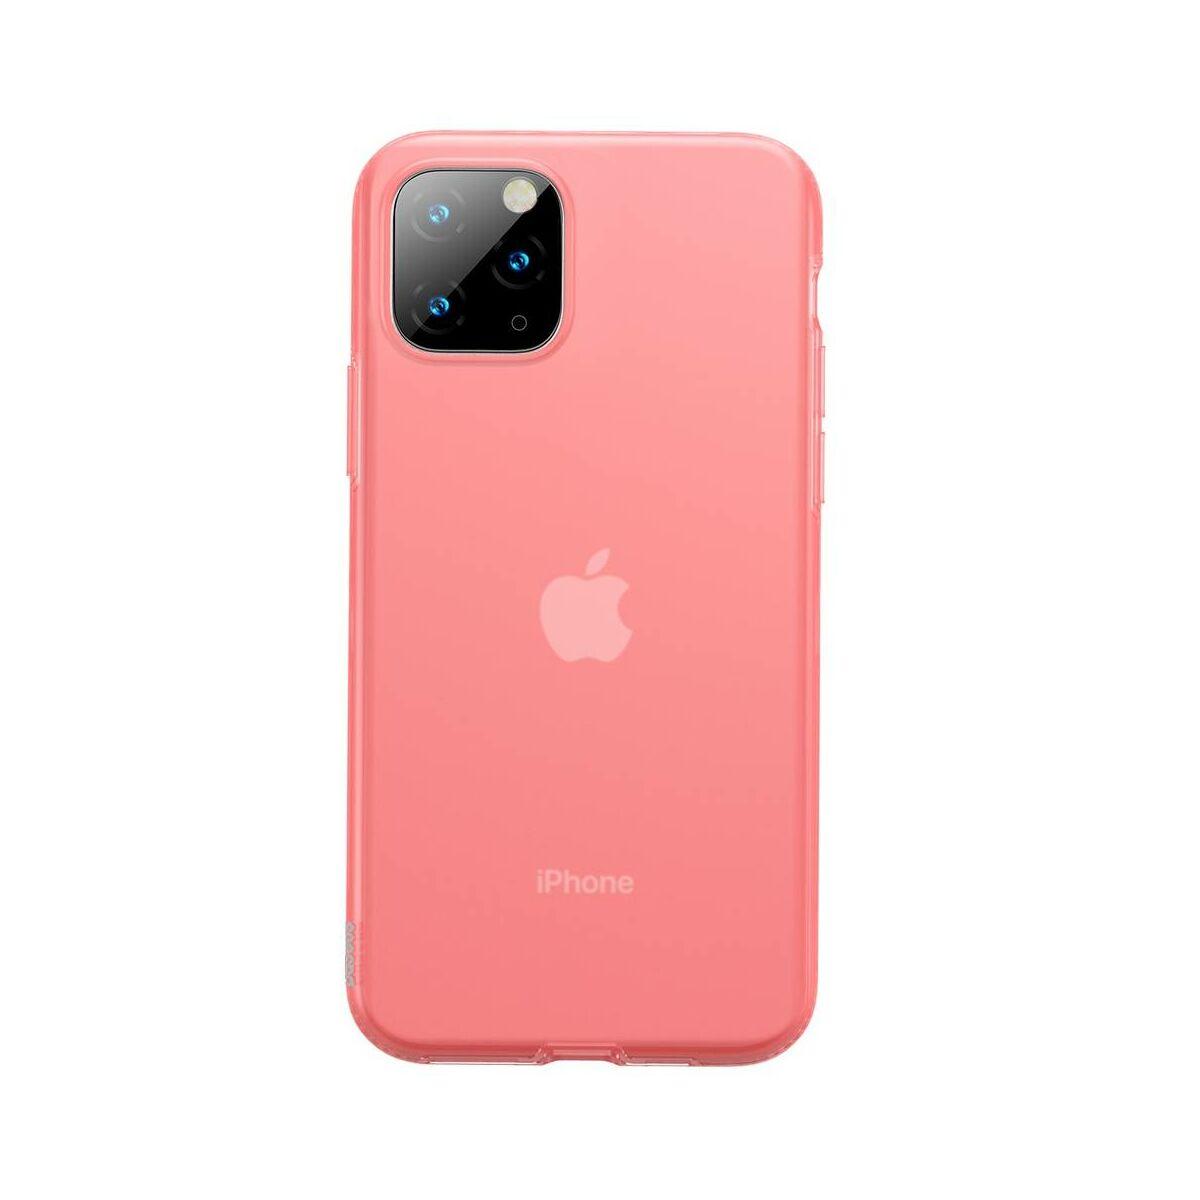 Baseus iPhone 11 Pro Max tok, Jelly Liquid Silica Gel Protective, átlátszó piros (WIAPIPH65S-GD09)